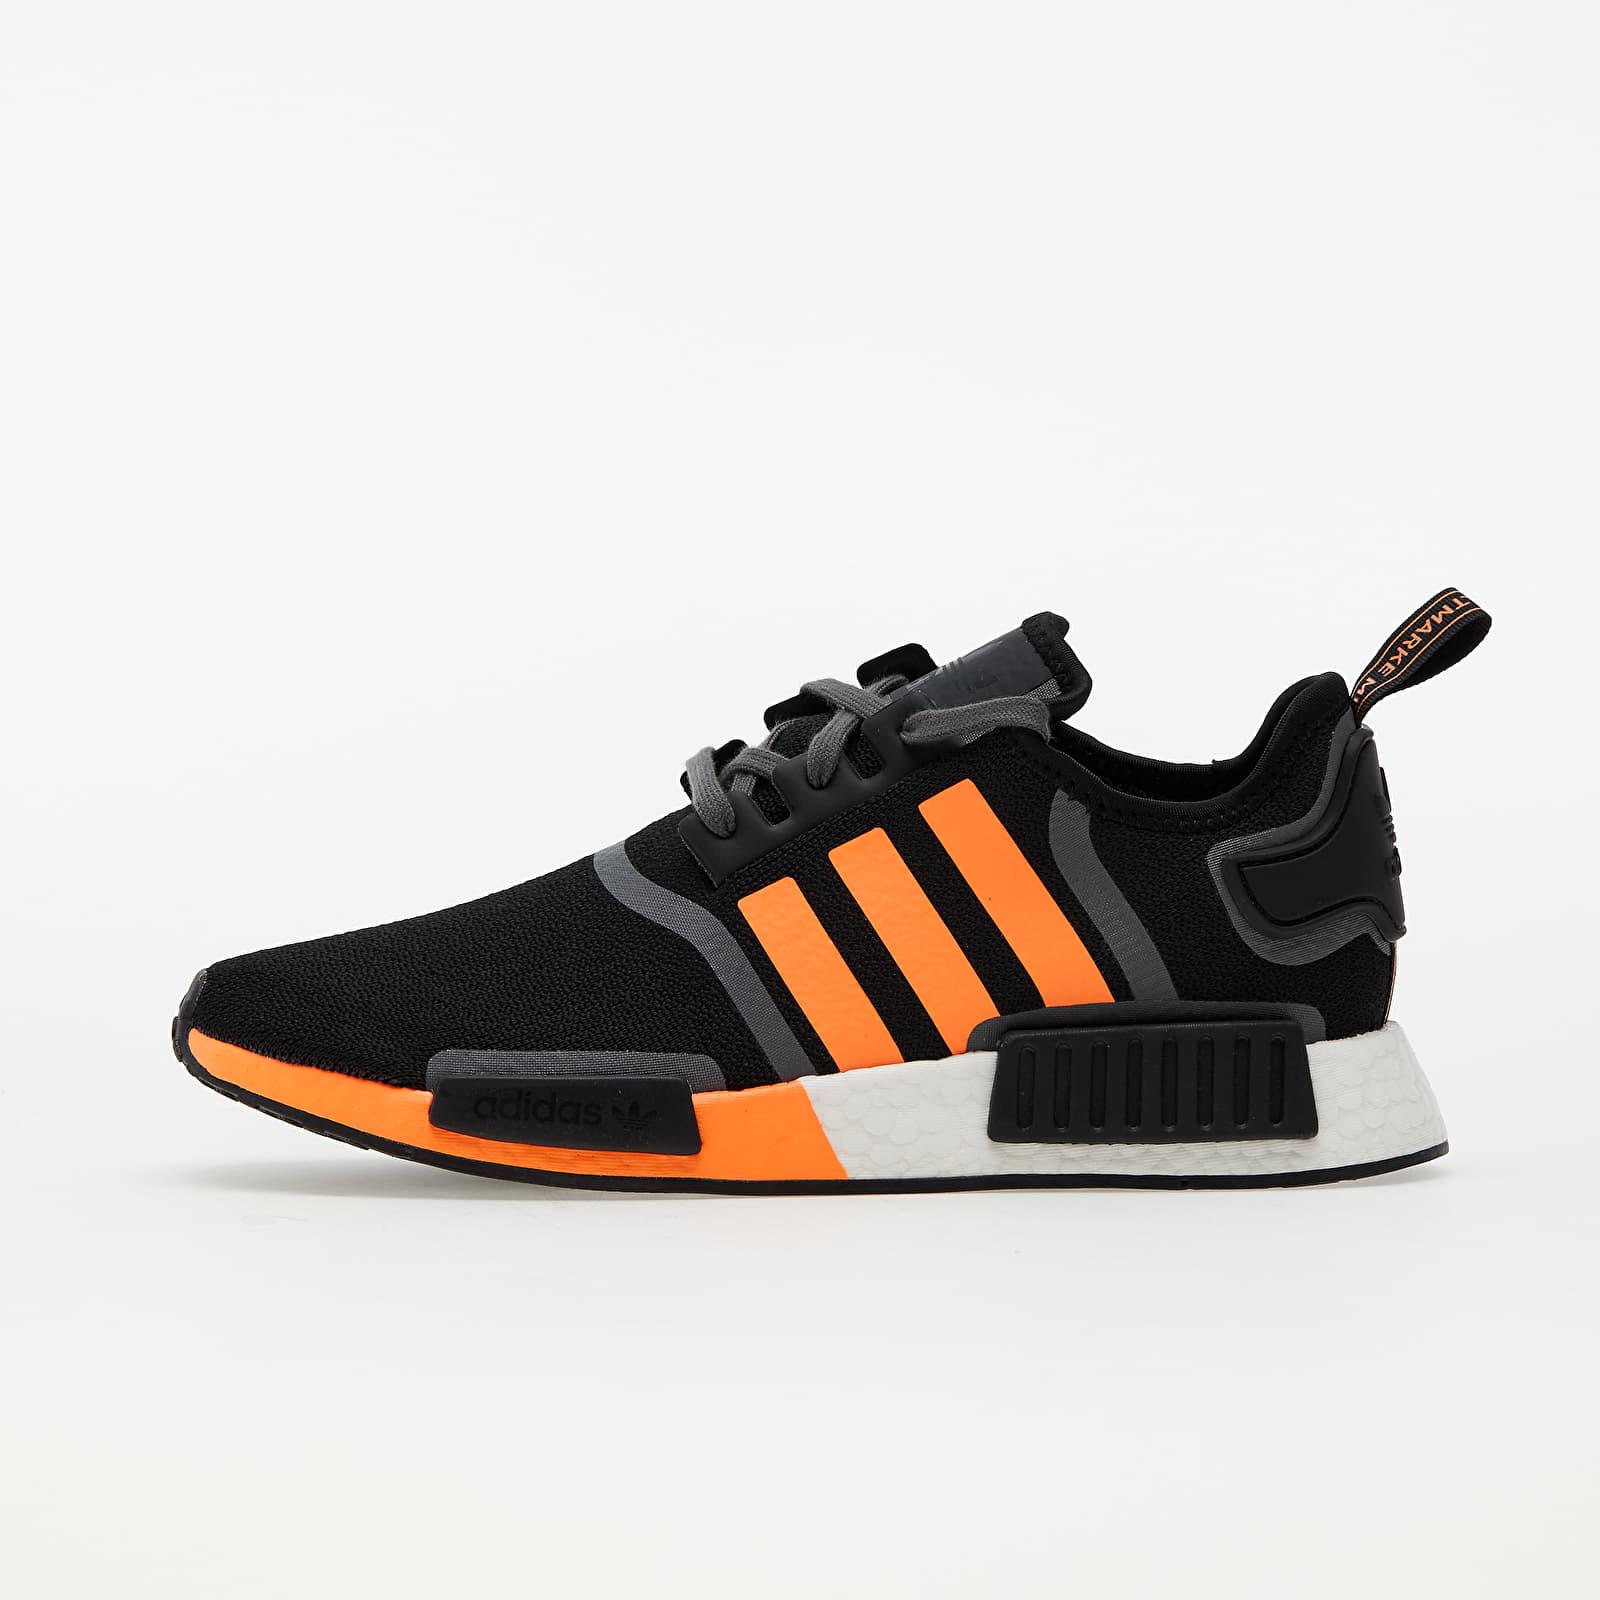 adidas NMD_R1 Core Black/ Screen Orange/ Grey Five EUR 38